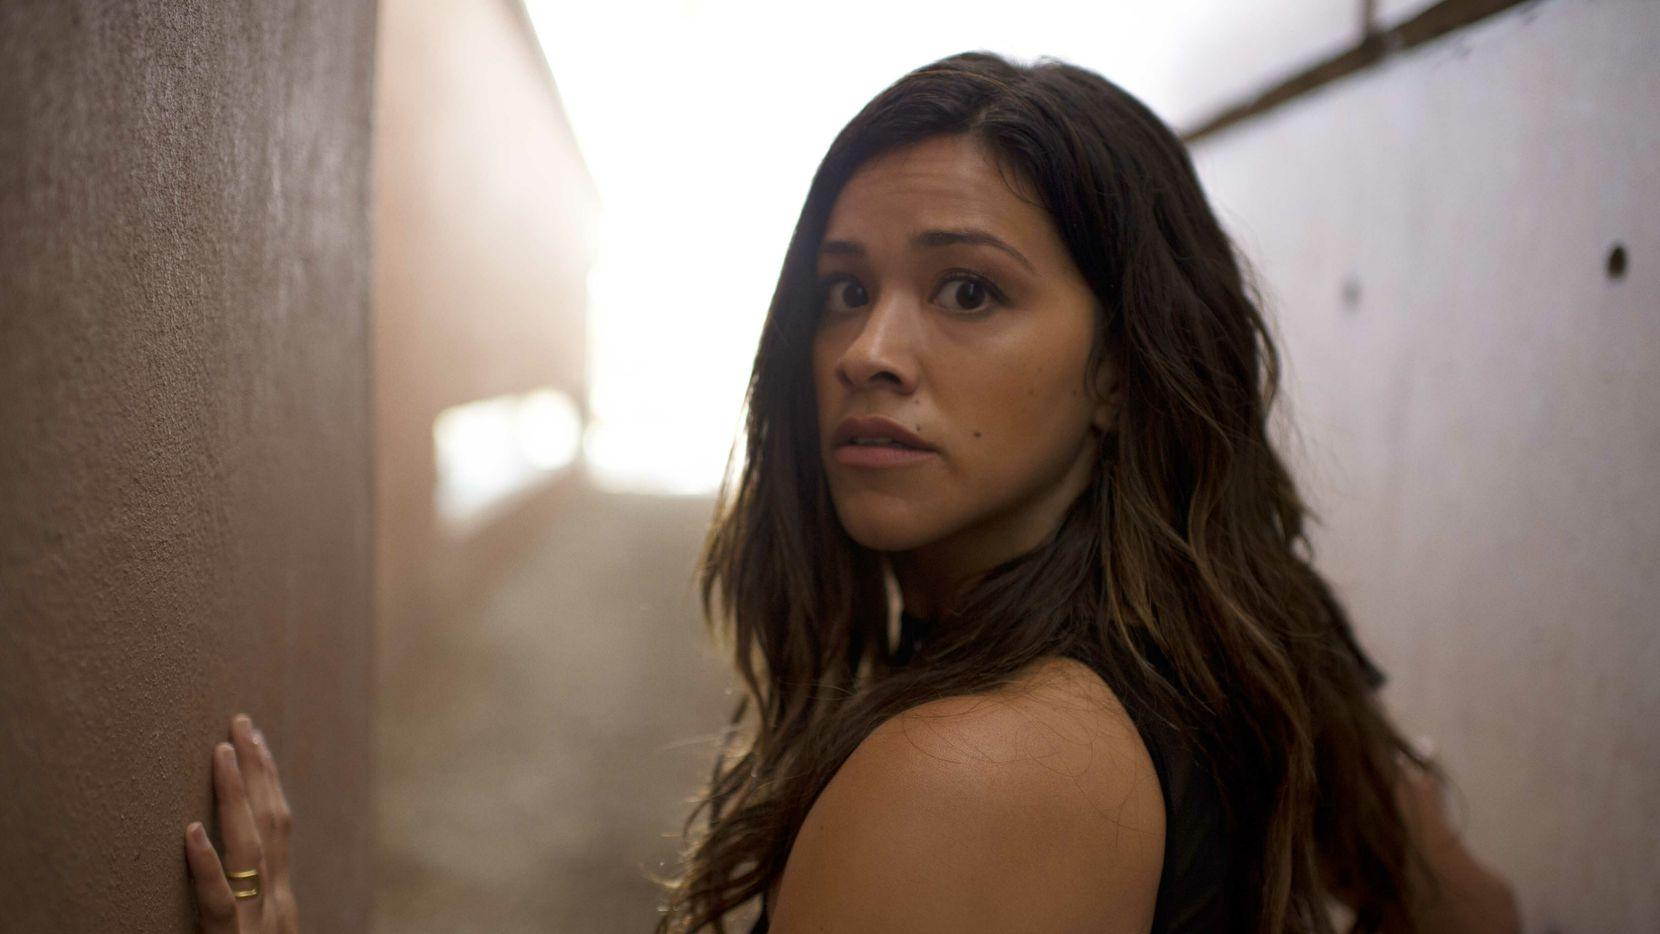 Filme de Sony Pictures 'Miss Bala' es protagonizado por Gina Rodríguez